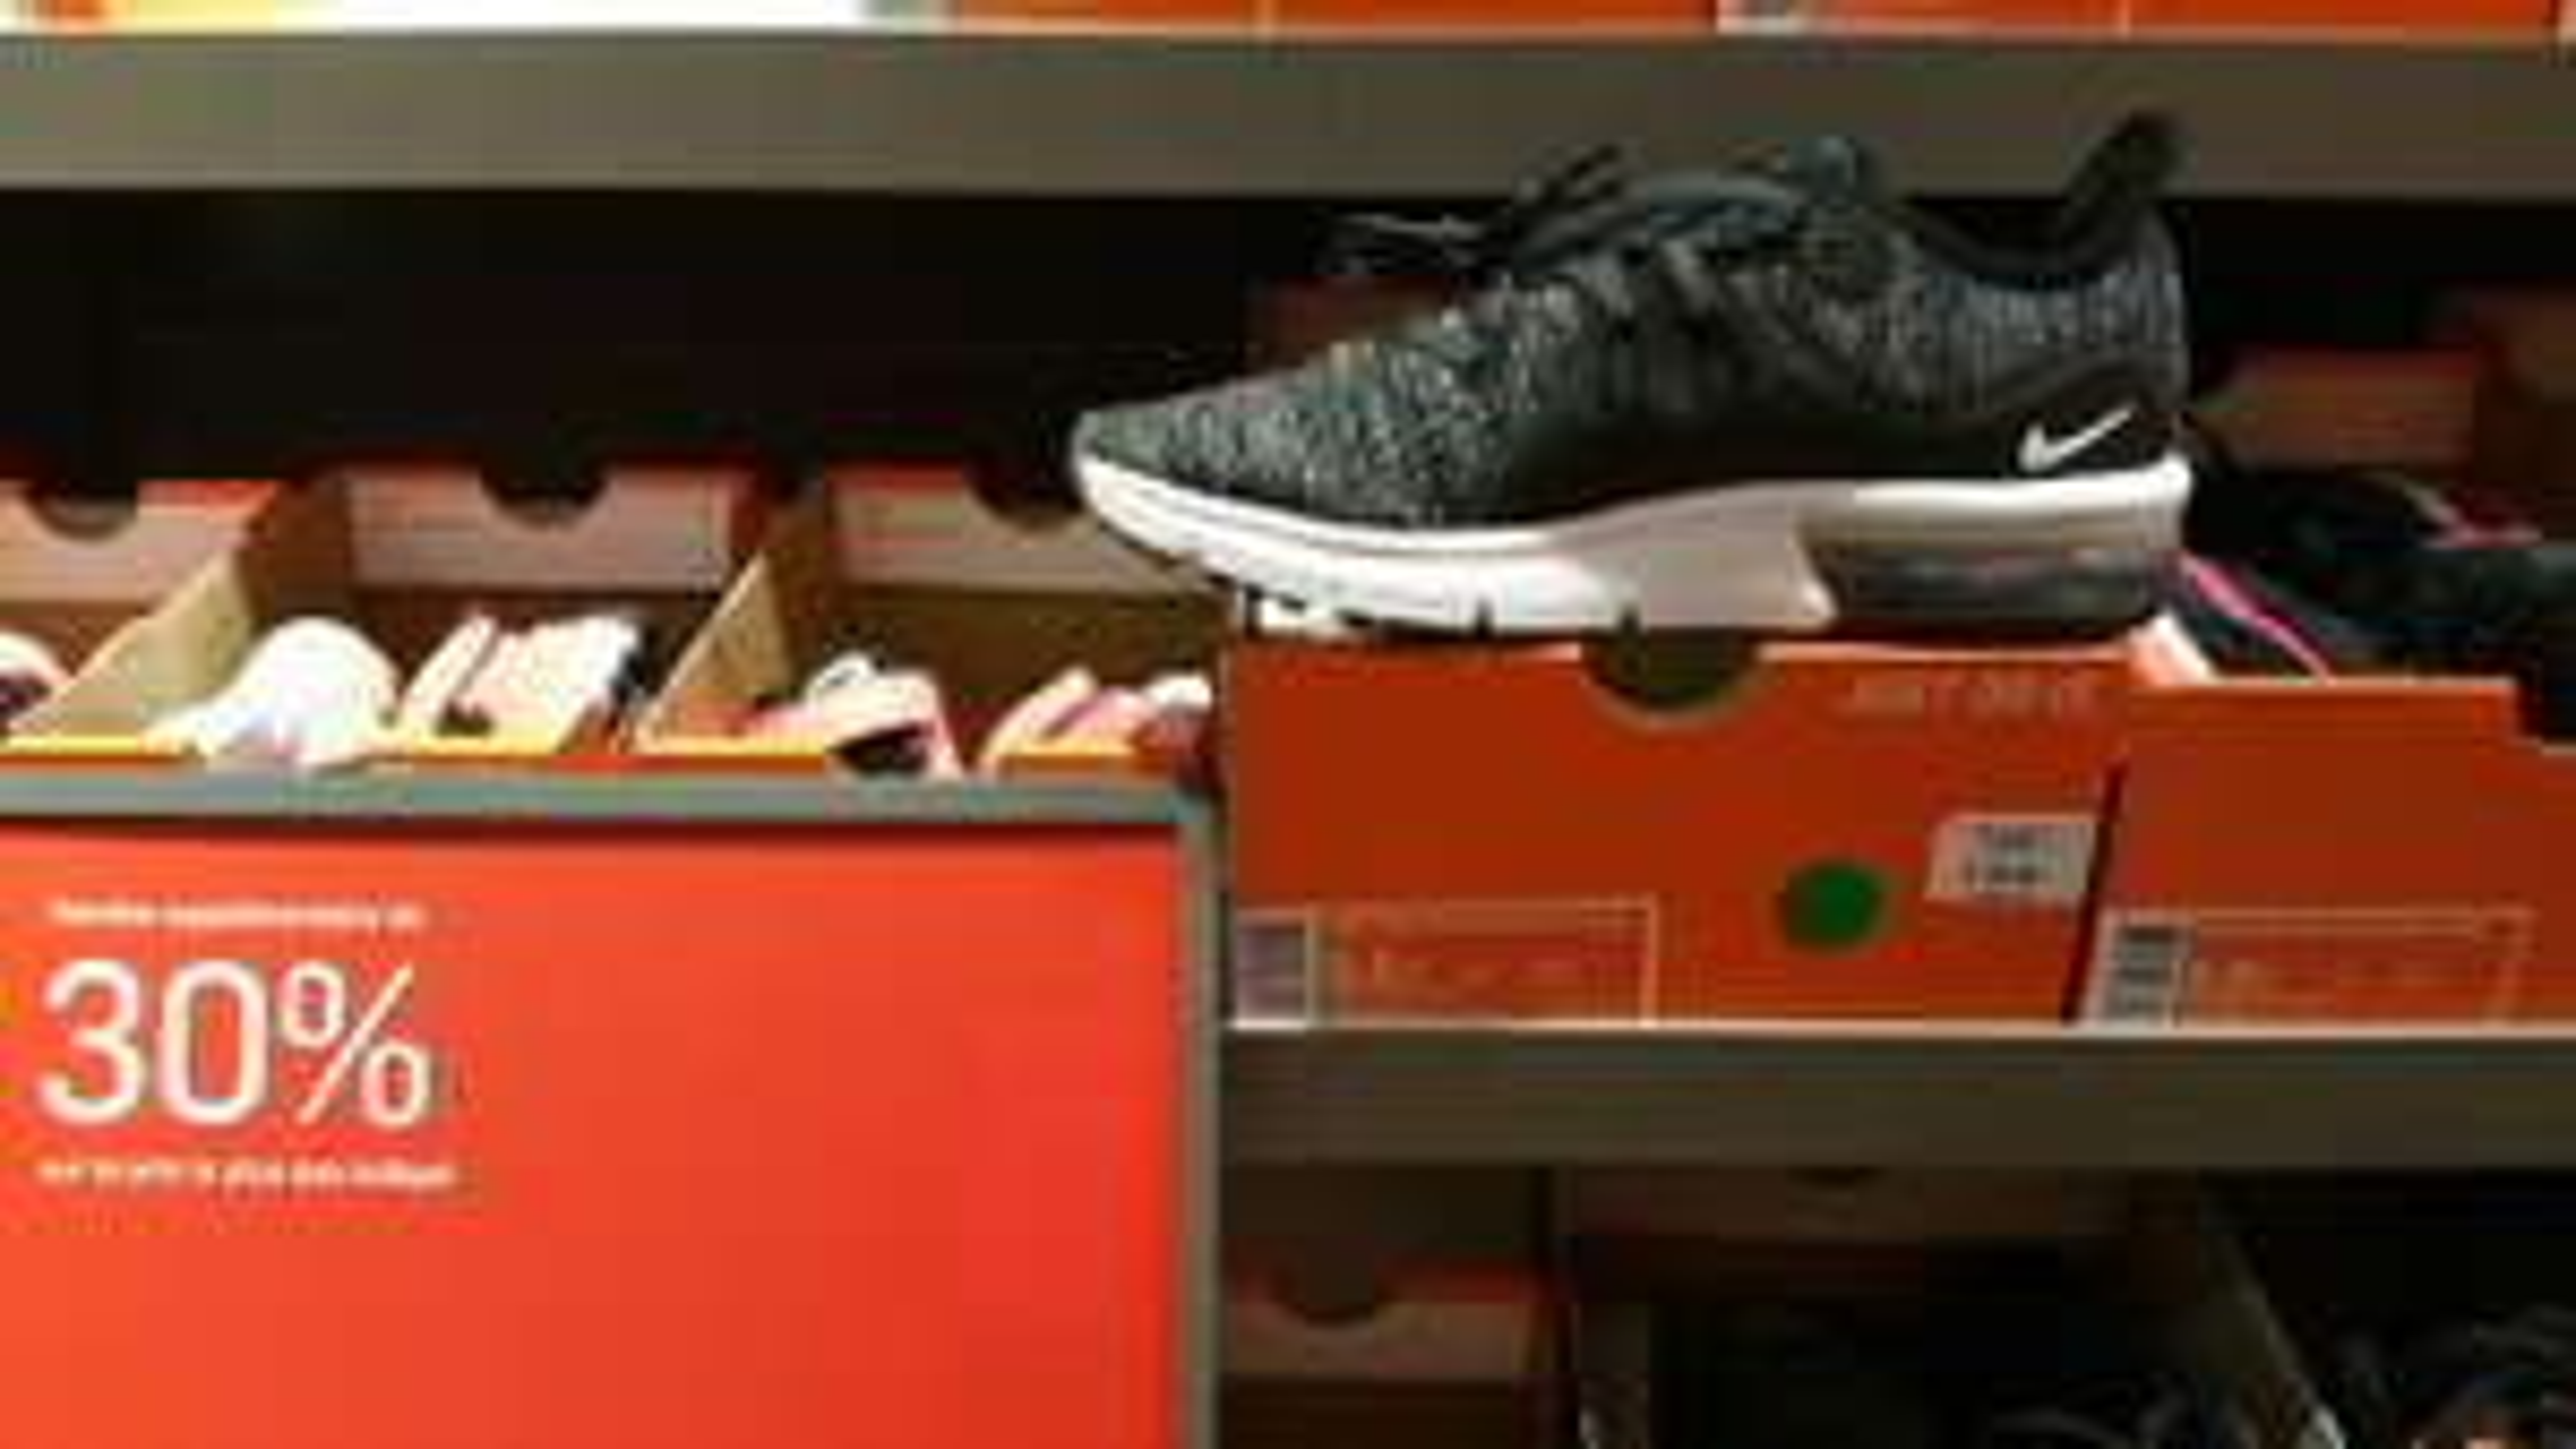 Chaussures Nike Air Max Sequent 3 - Tailles au choix - Mac Arthur Troyes (10)